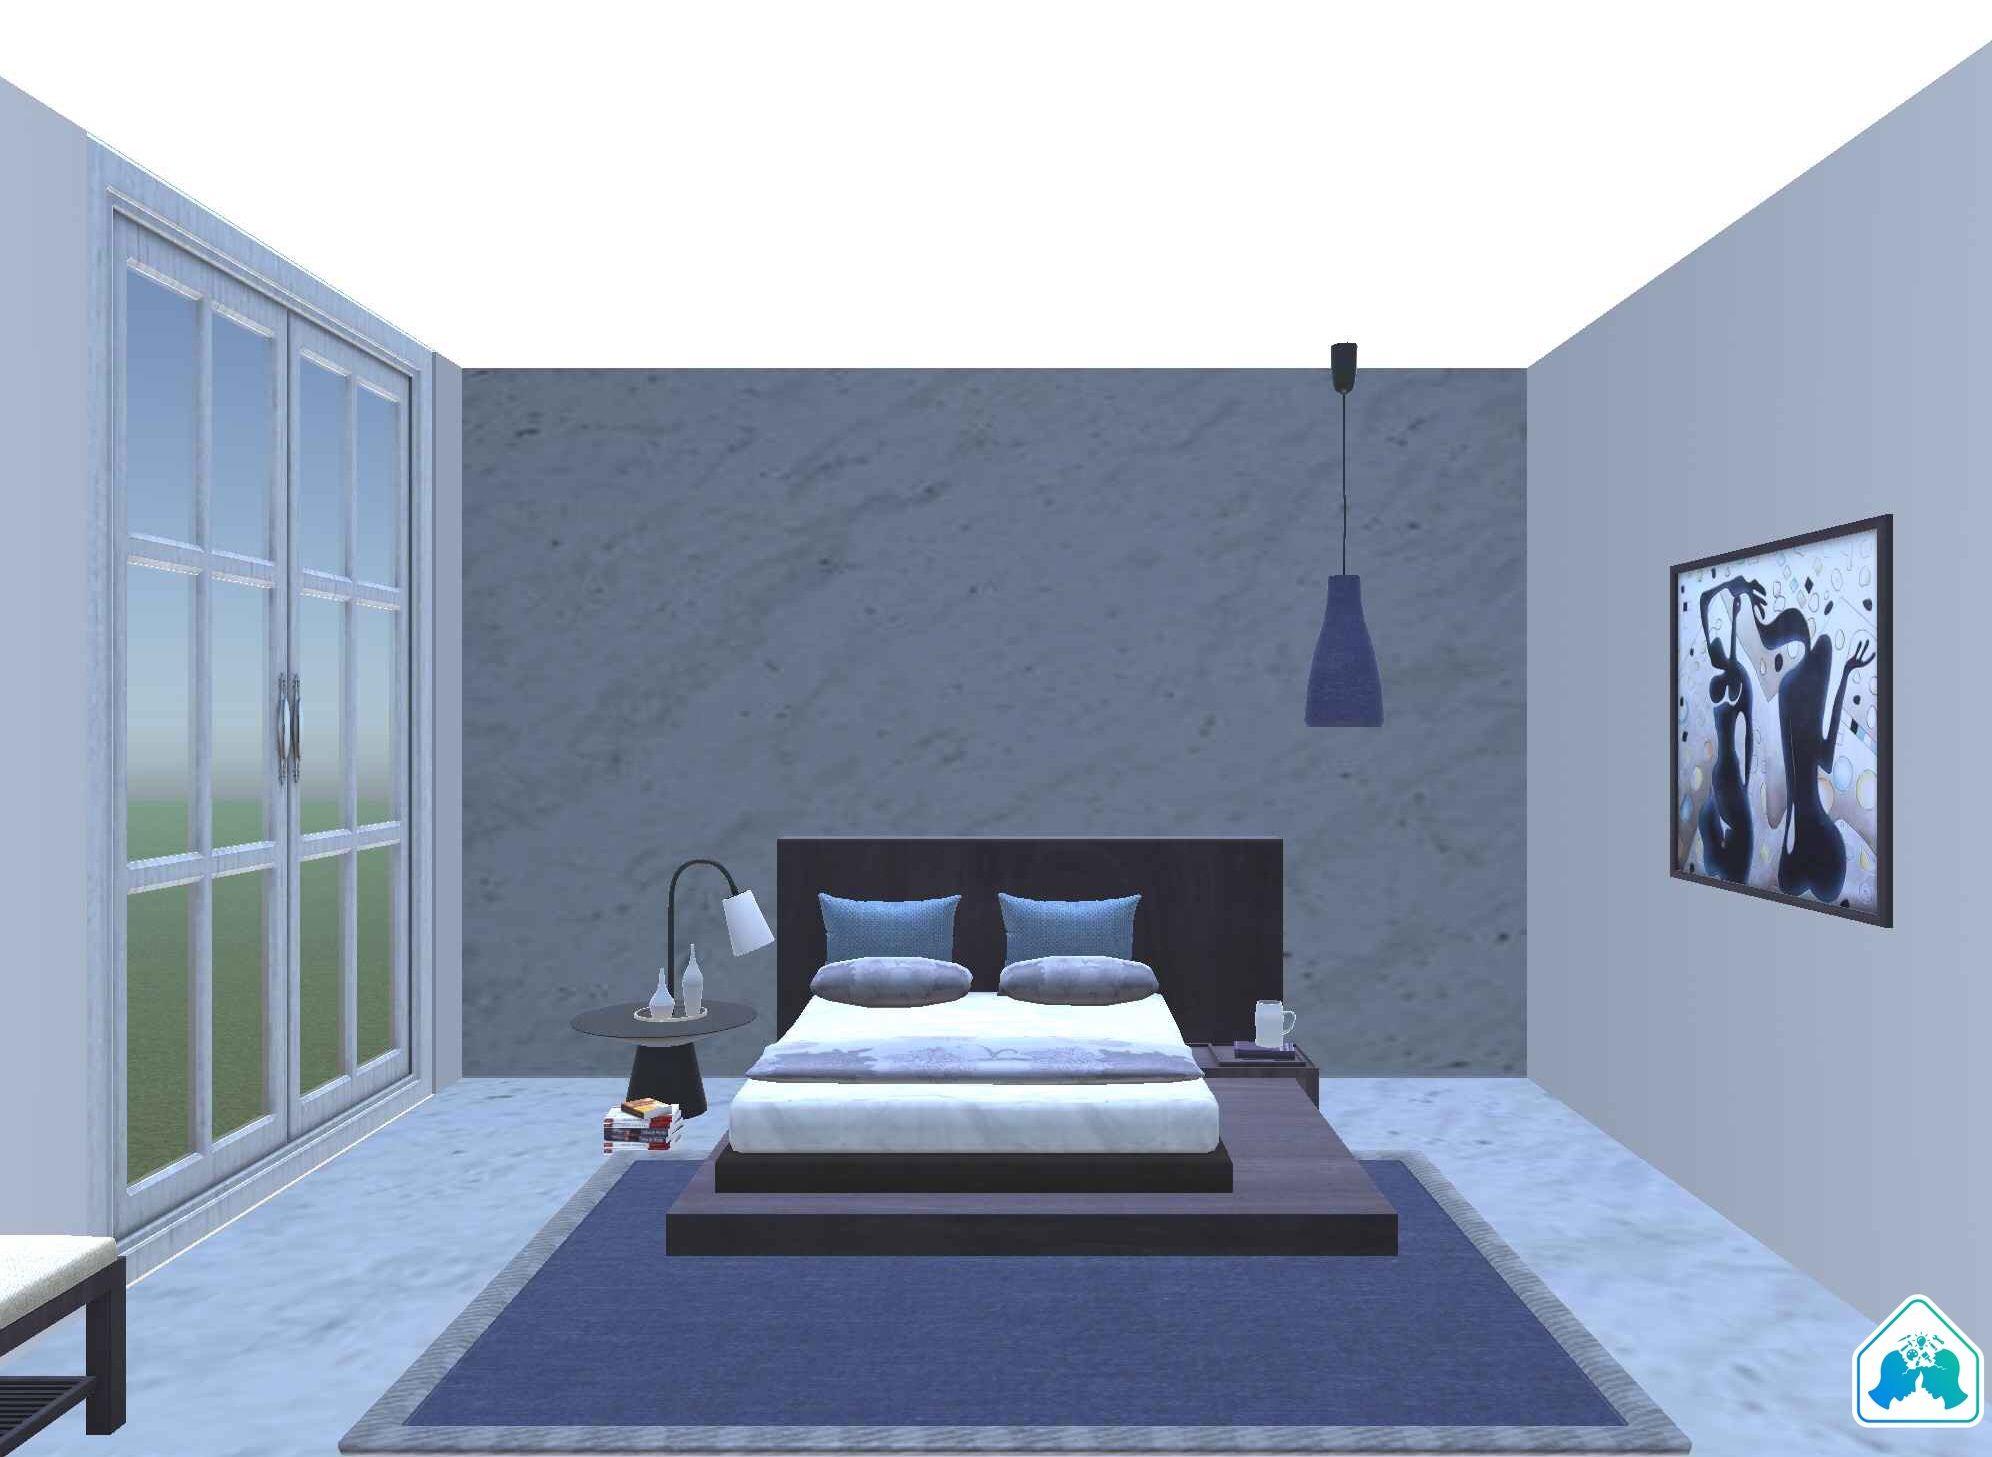 Created with Design Crasher 3D app. Modern minimalist